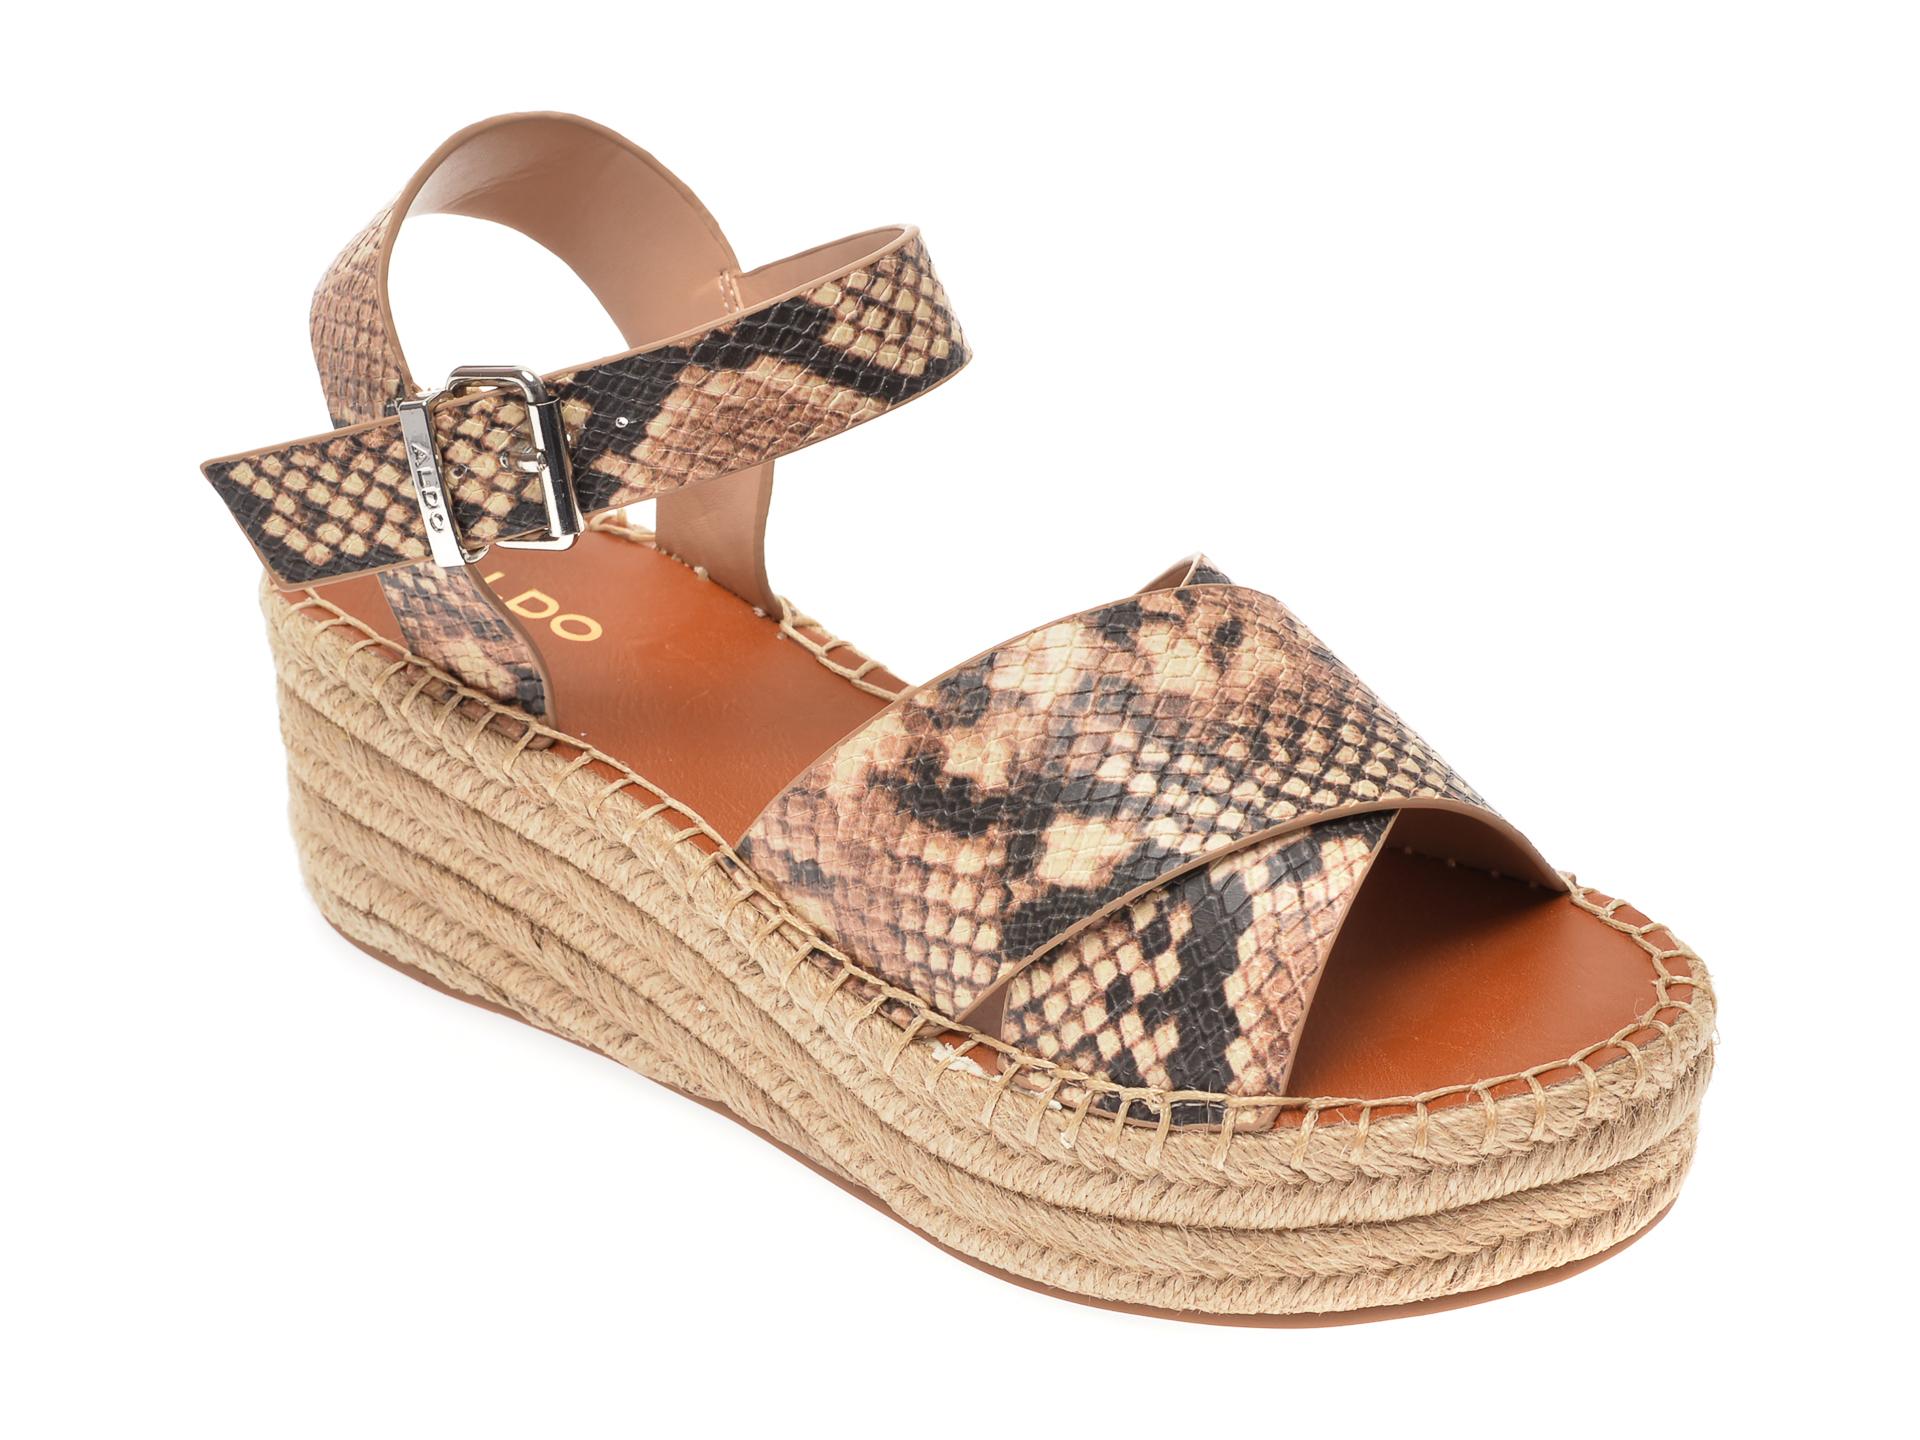 Sandale ALDO bej, Tineviel101, din piele ecologica